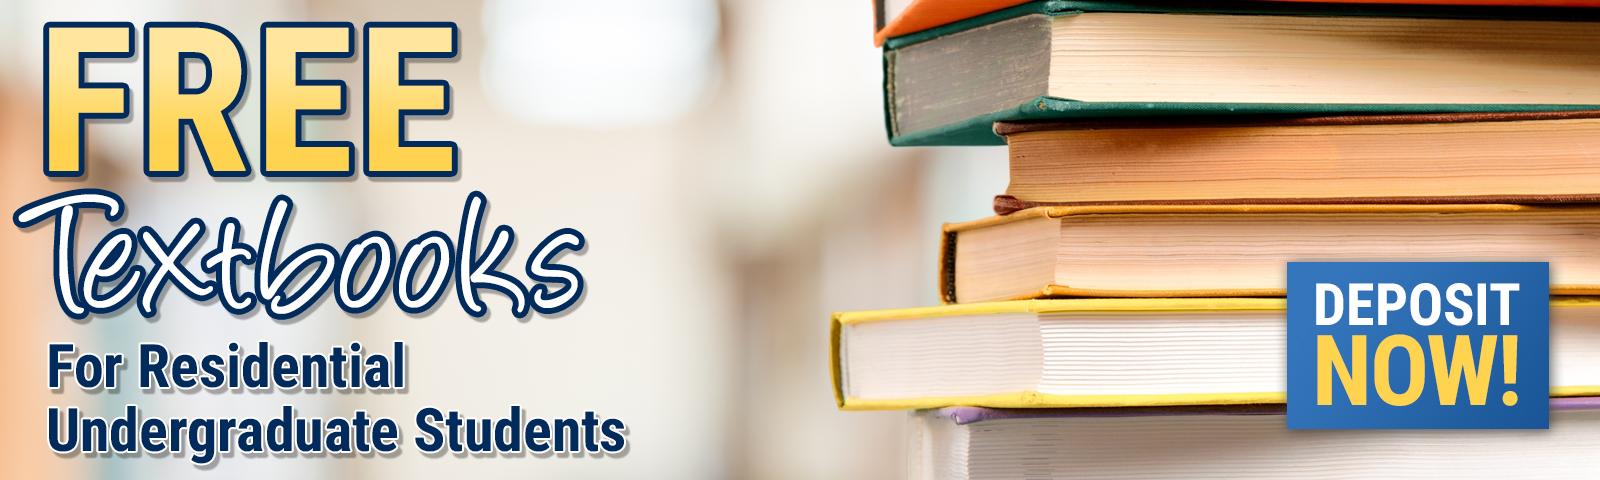 Free Textbooks